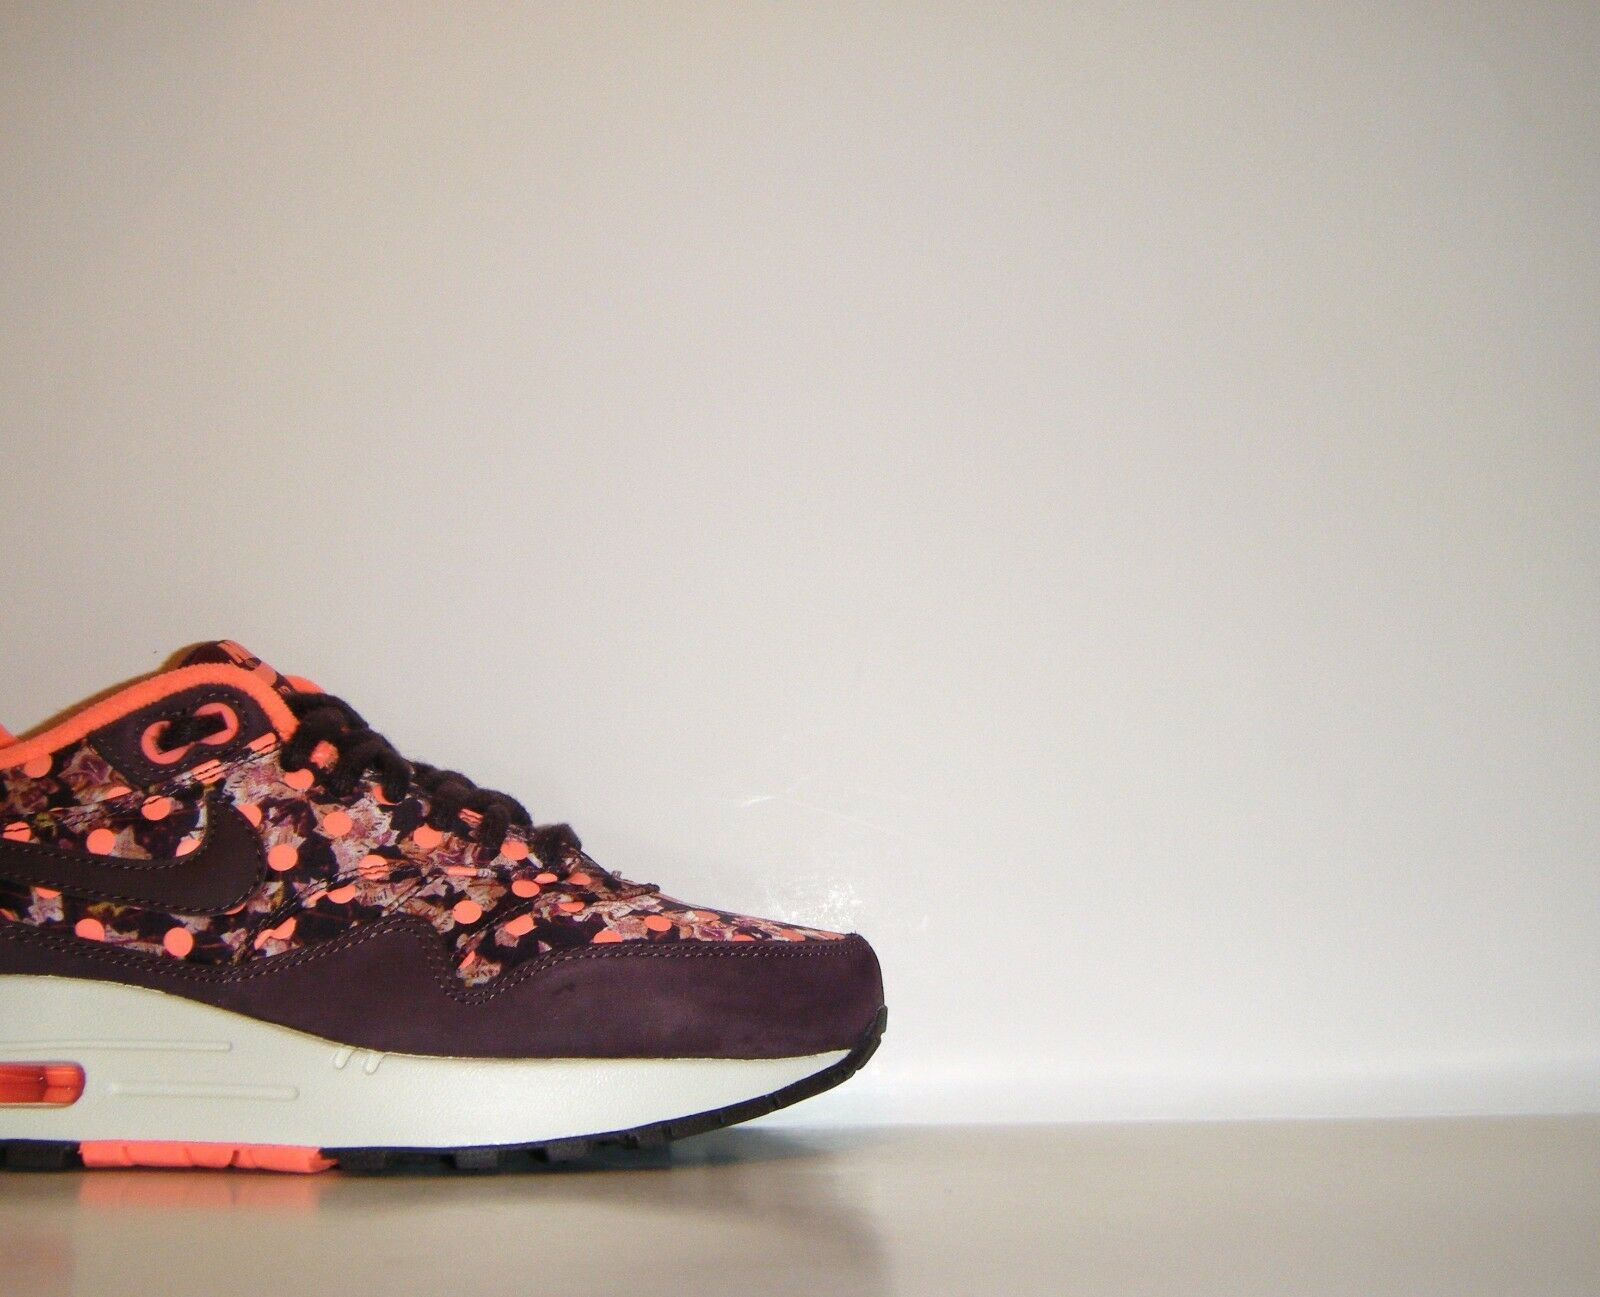 Womens 2014 Nike Air Max 1 LIB Premium Liberty Of London QS Sz 5.5 SP 540855-600